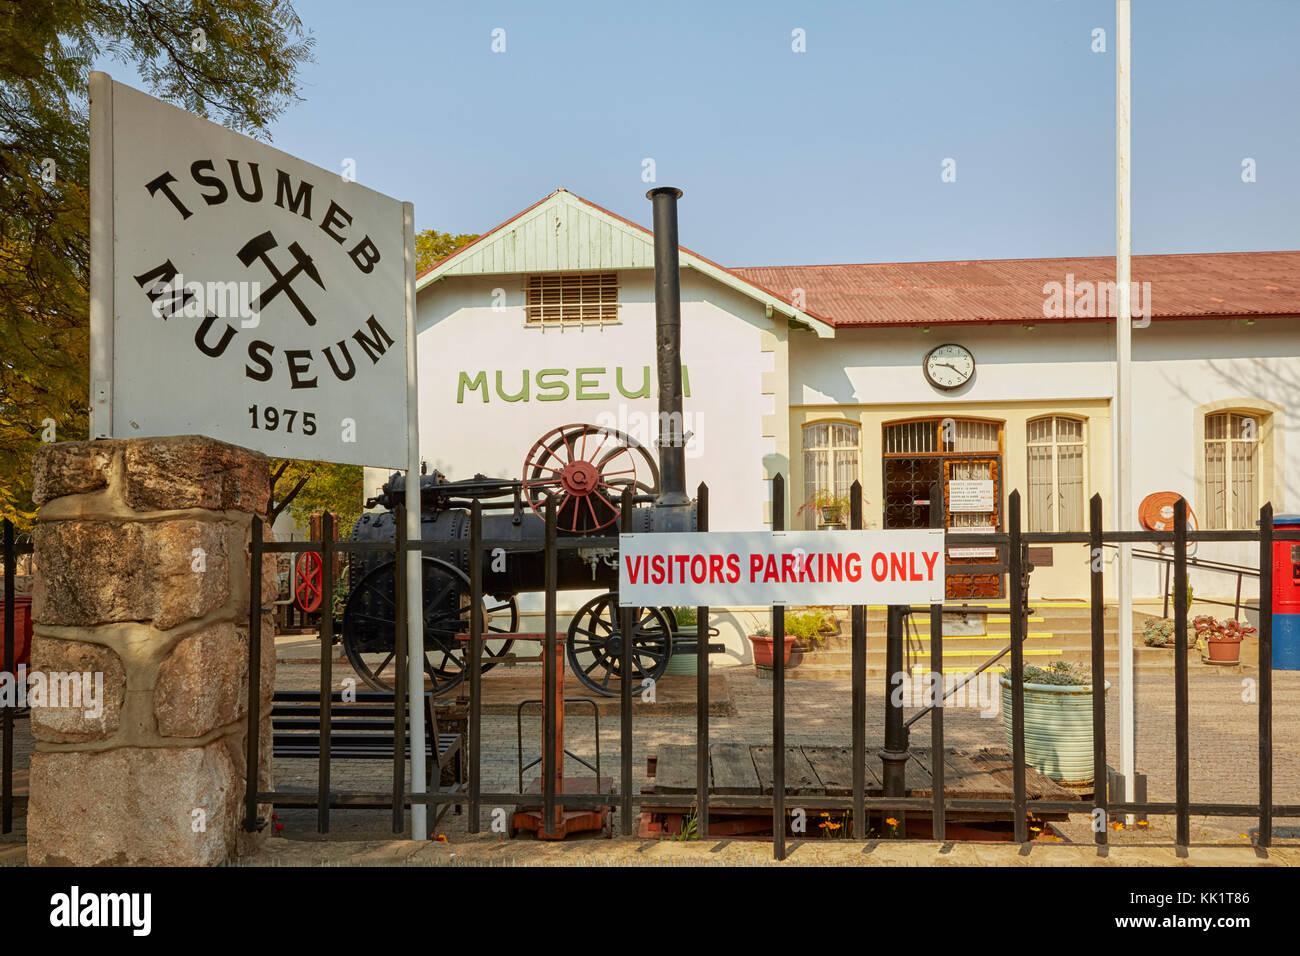 Tsumeb Museum, Tsumeb, Namibia, Africa - Stock Image